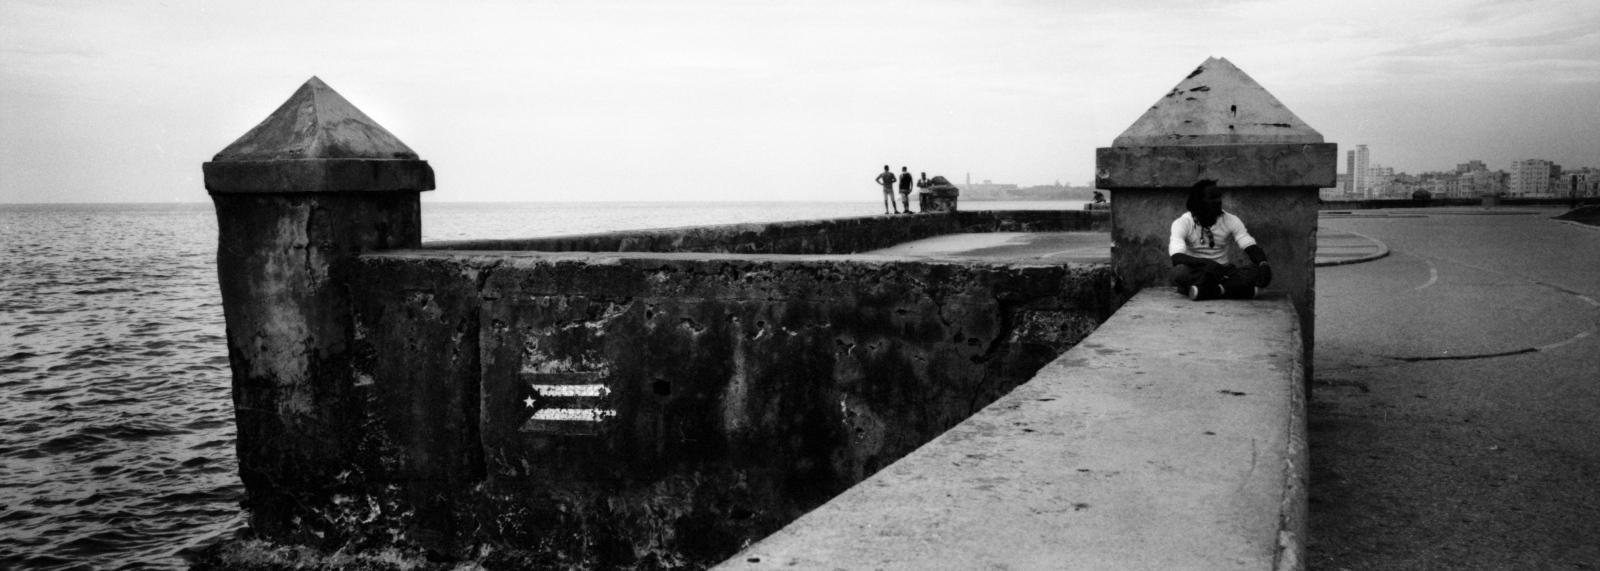 Photography image - Loading Habana_002.jpg